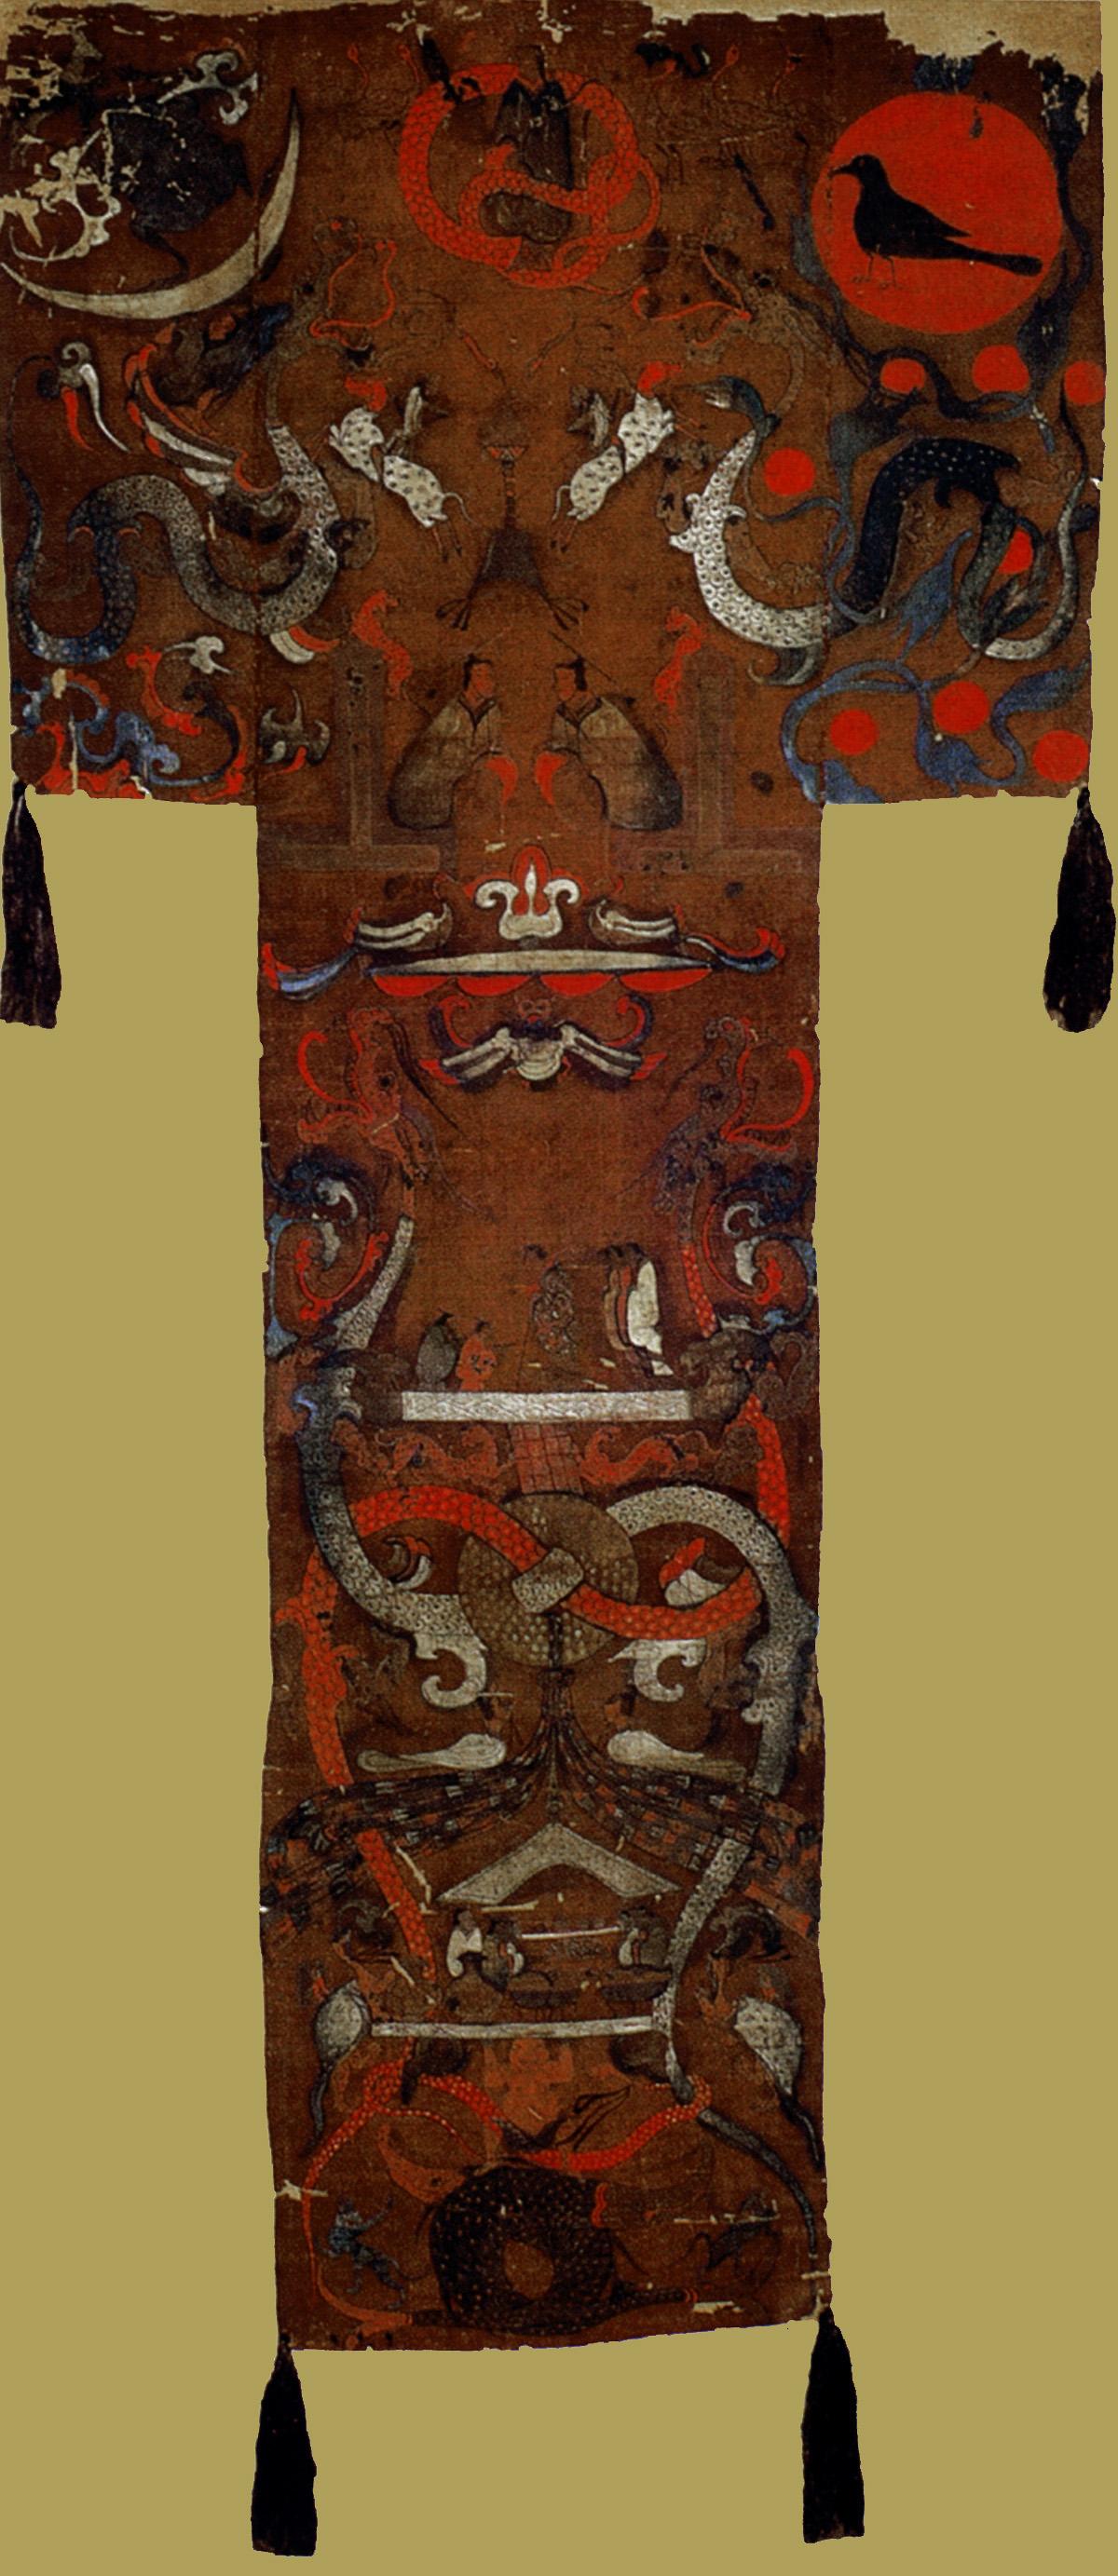 http://upload.wikimedia.org/wikipedia/commons/f/f3/Western_Han_Chinese_Silk.JPG